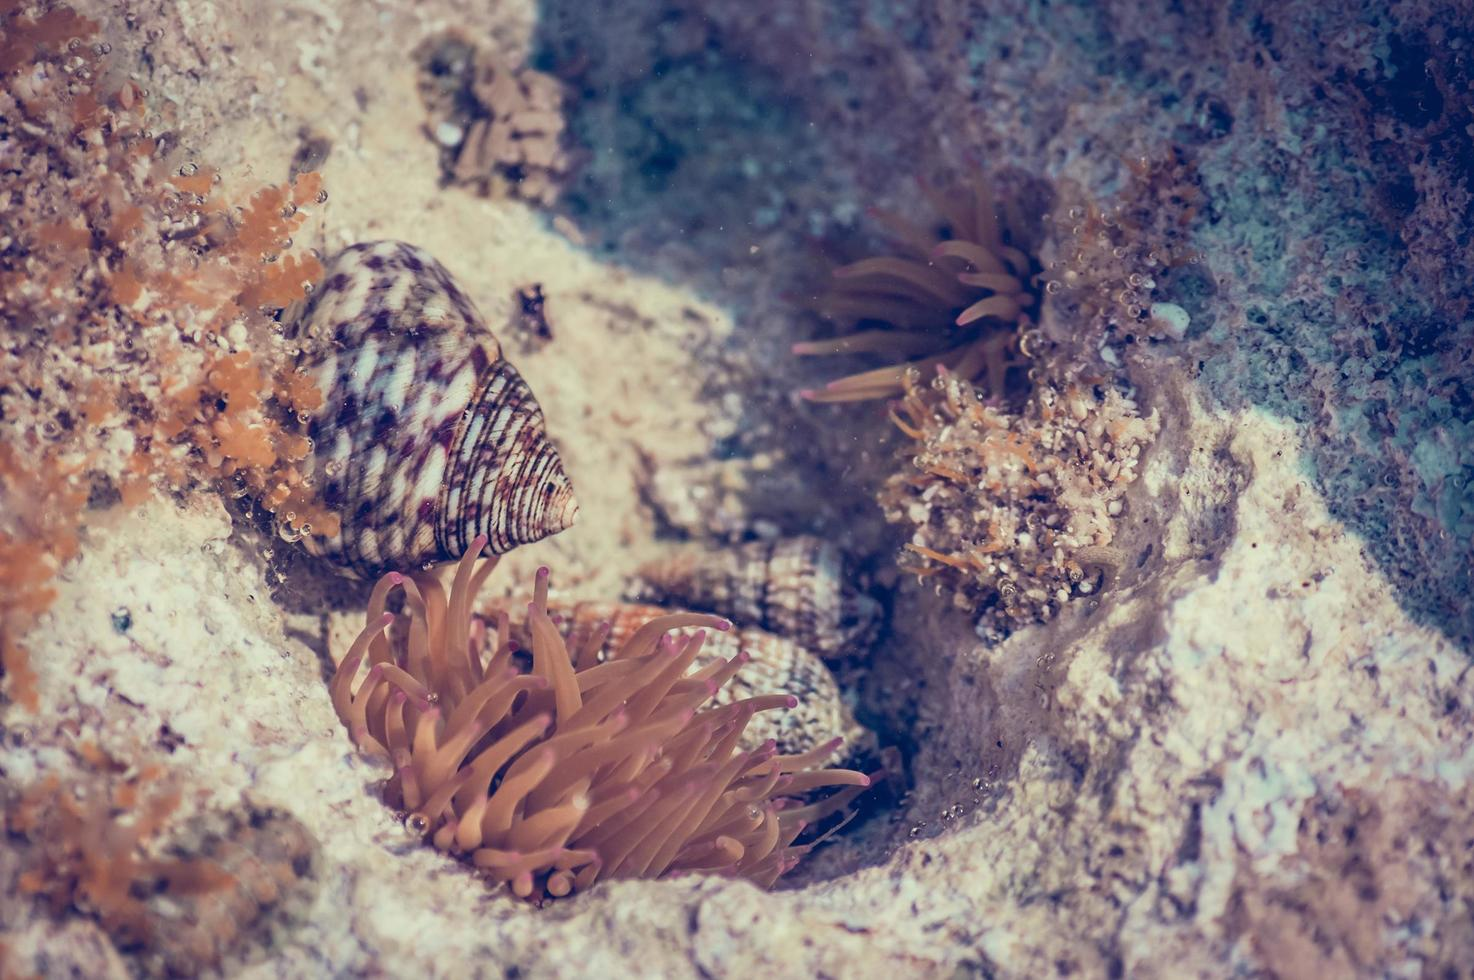 koralen en rivierkreeften foto